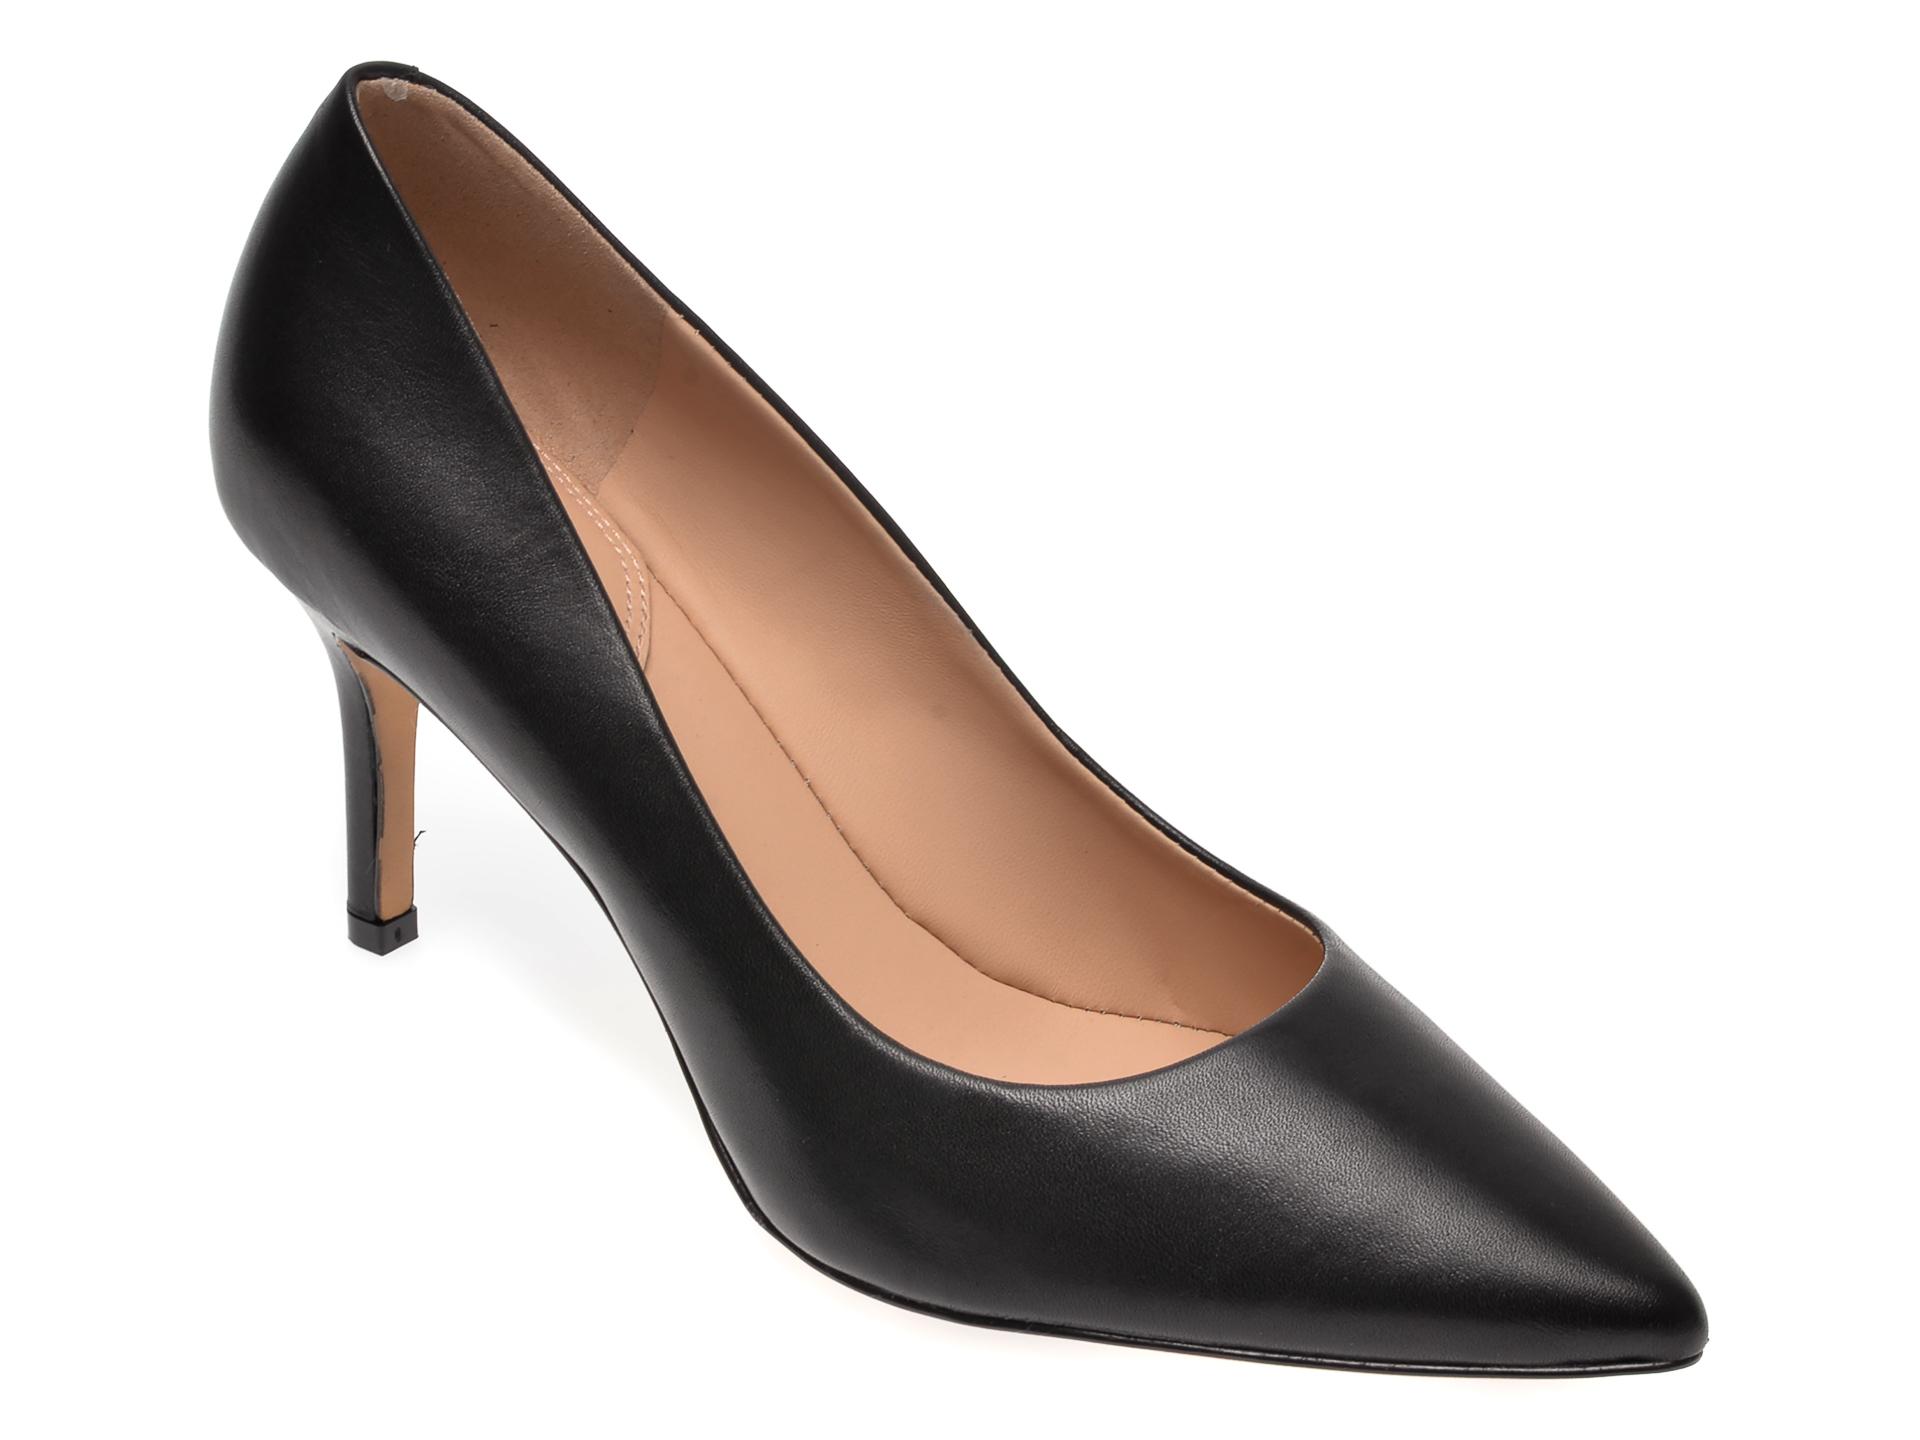 Pantofi ALDO negri, Coronitiflex001, din piele naturala imagine